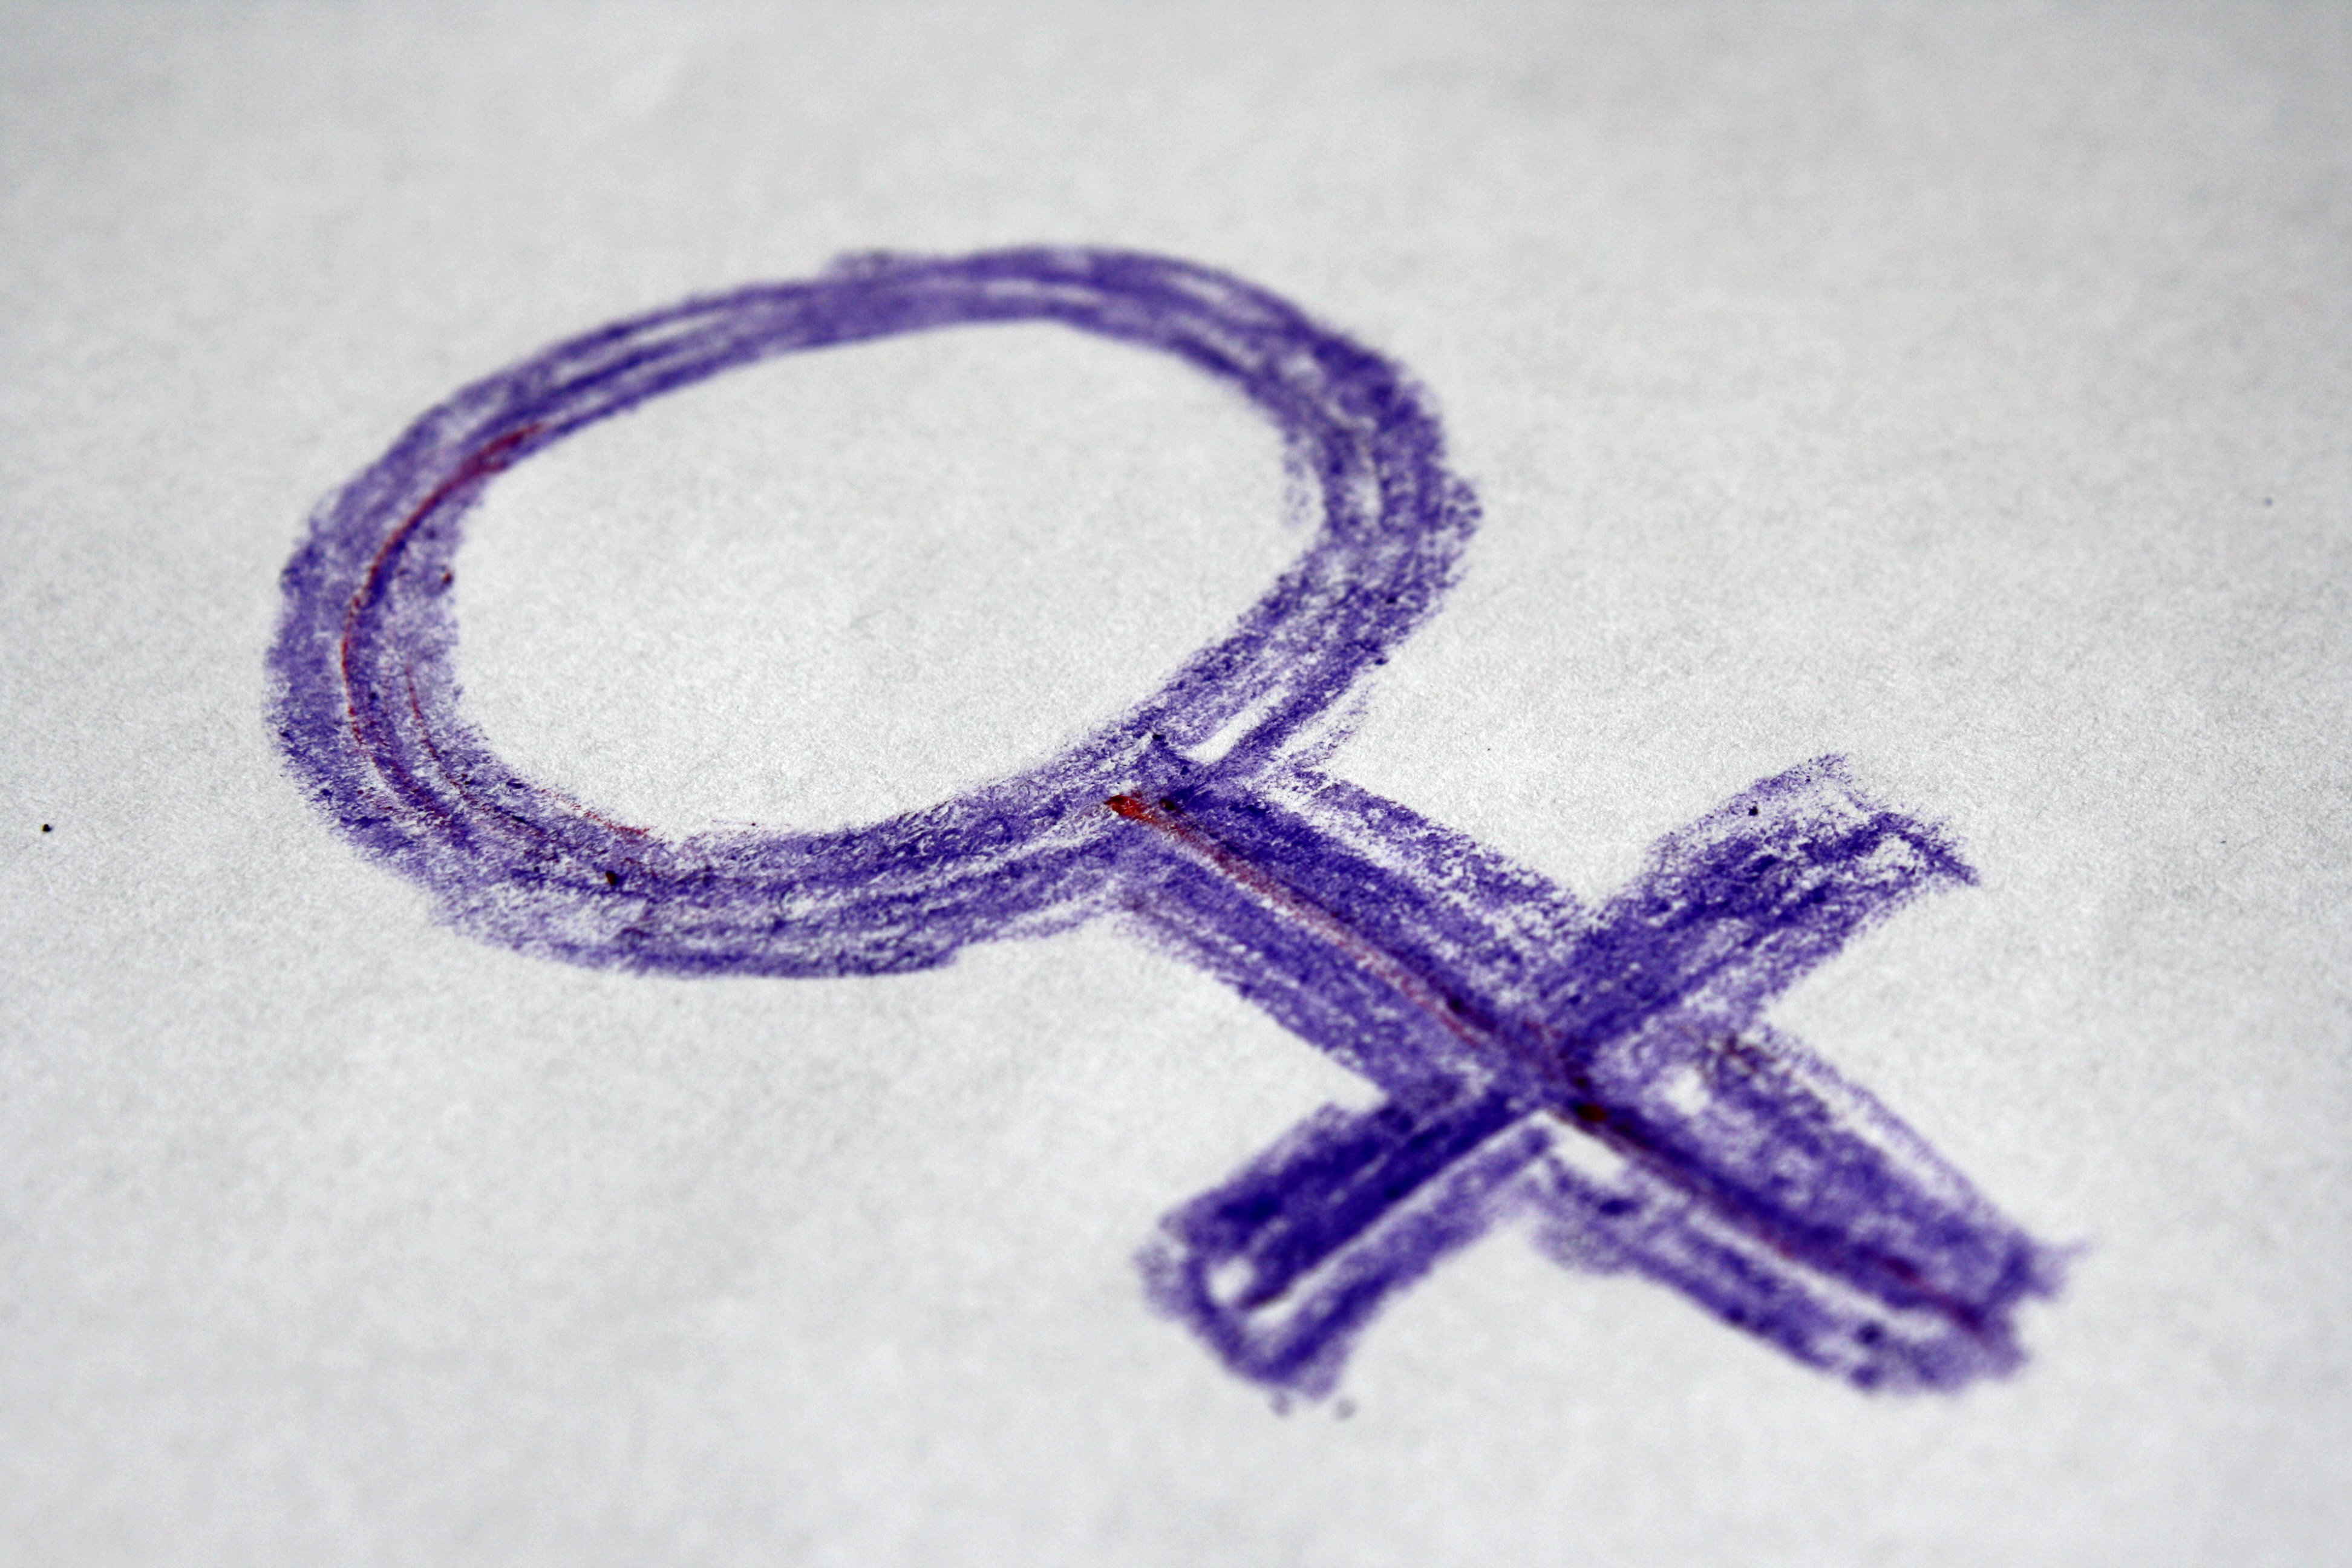 Purple Crayon Drawn Female Gender Sign Or Symbol Photos Public Domain